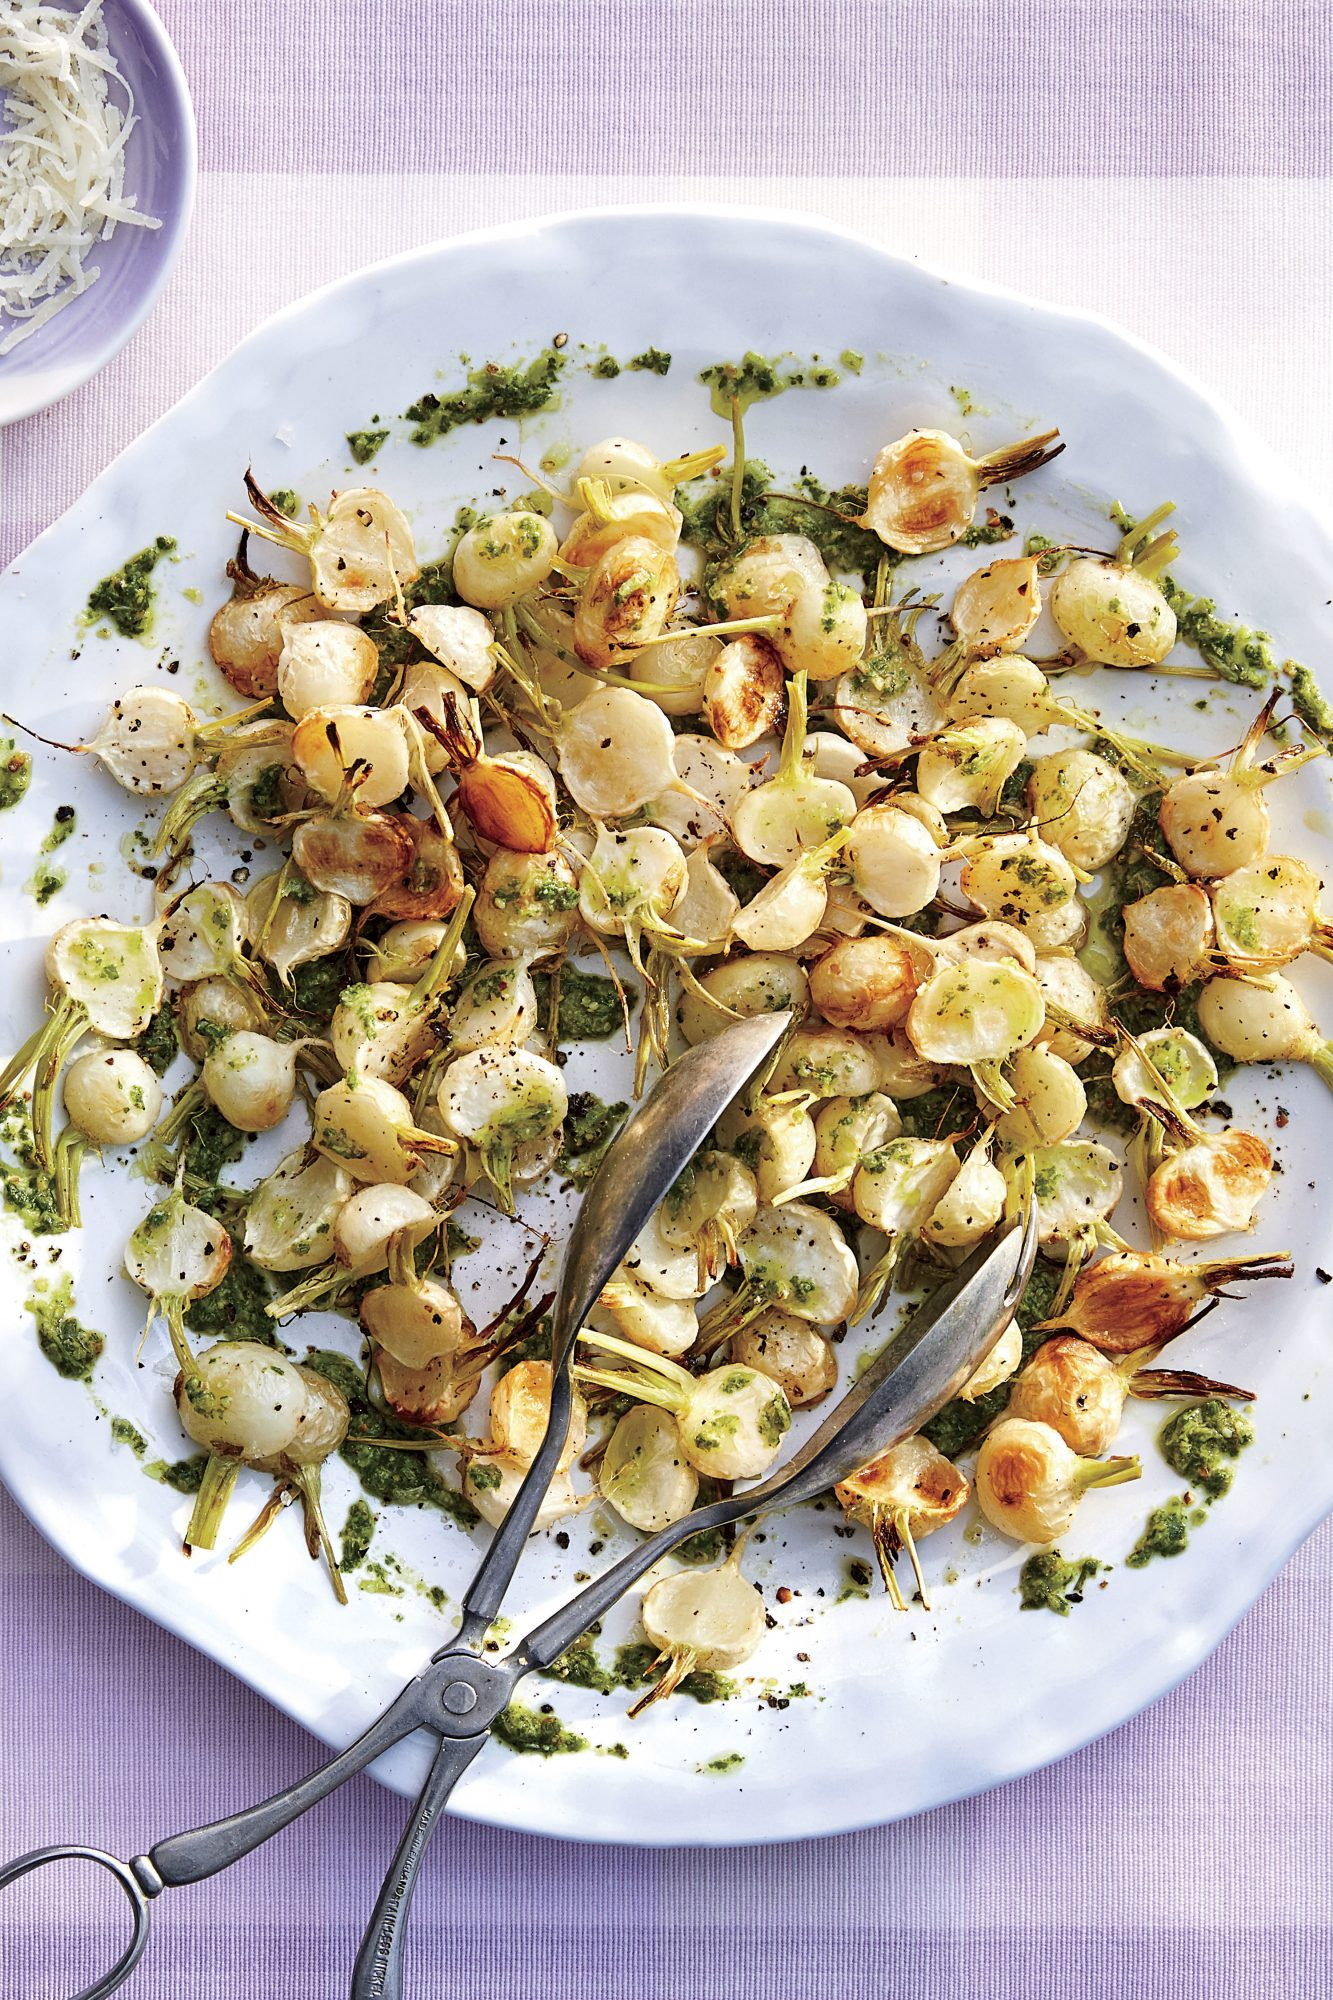 Roasted Baby Turnips with Turnip Green Pesto